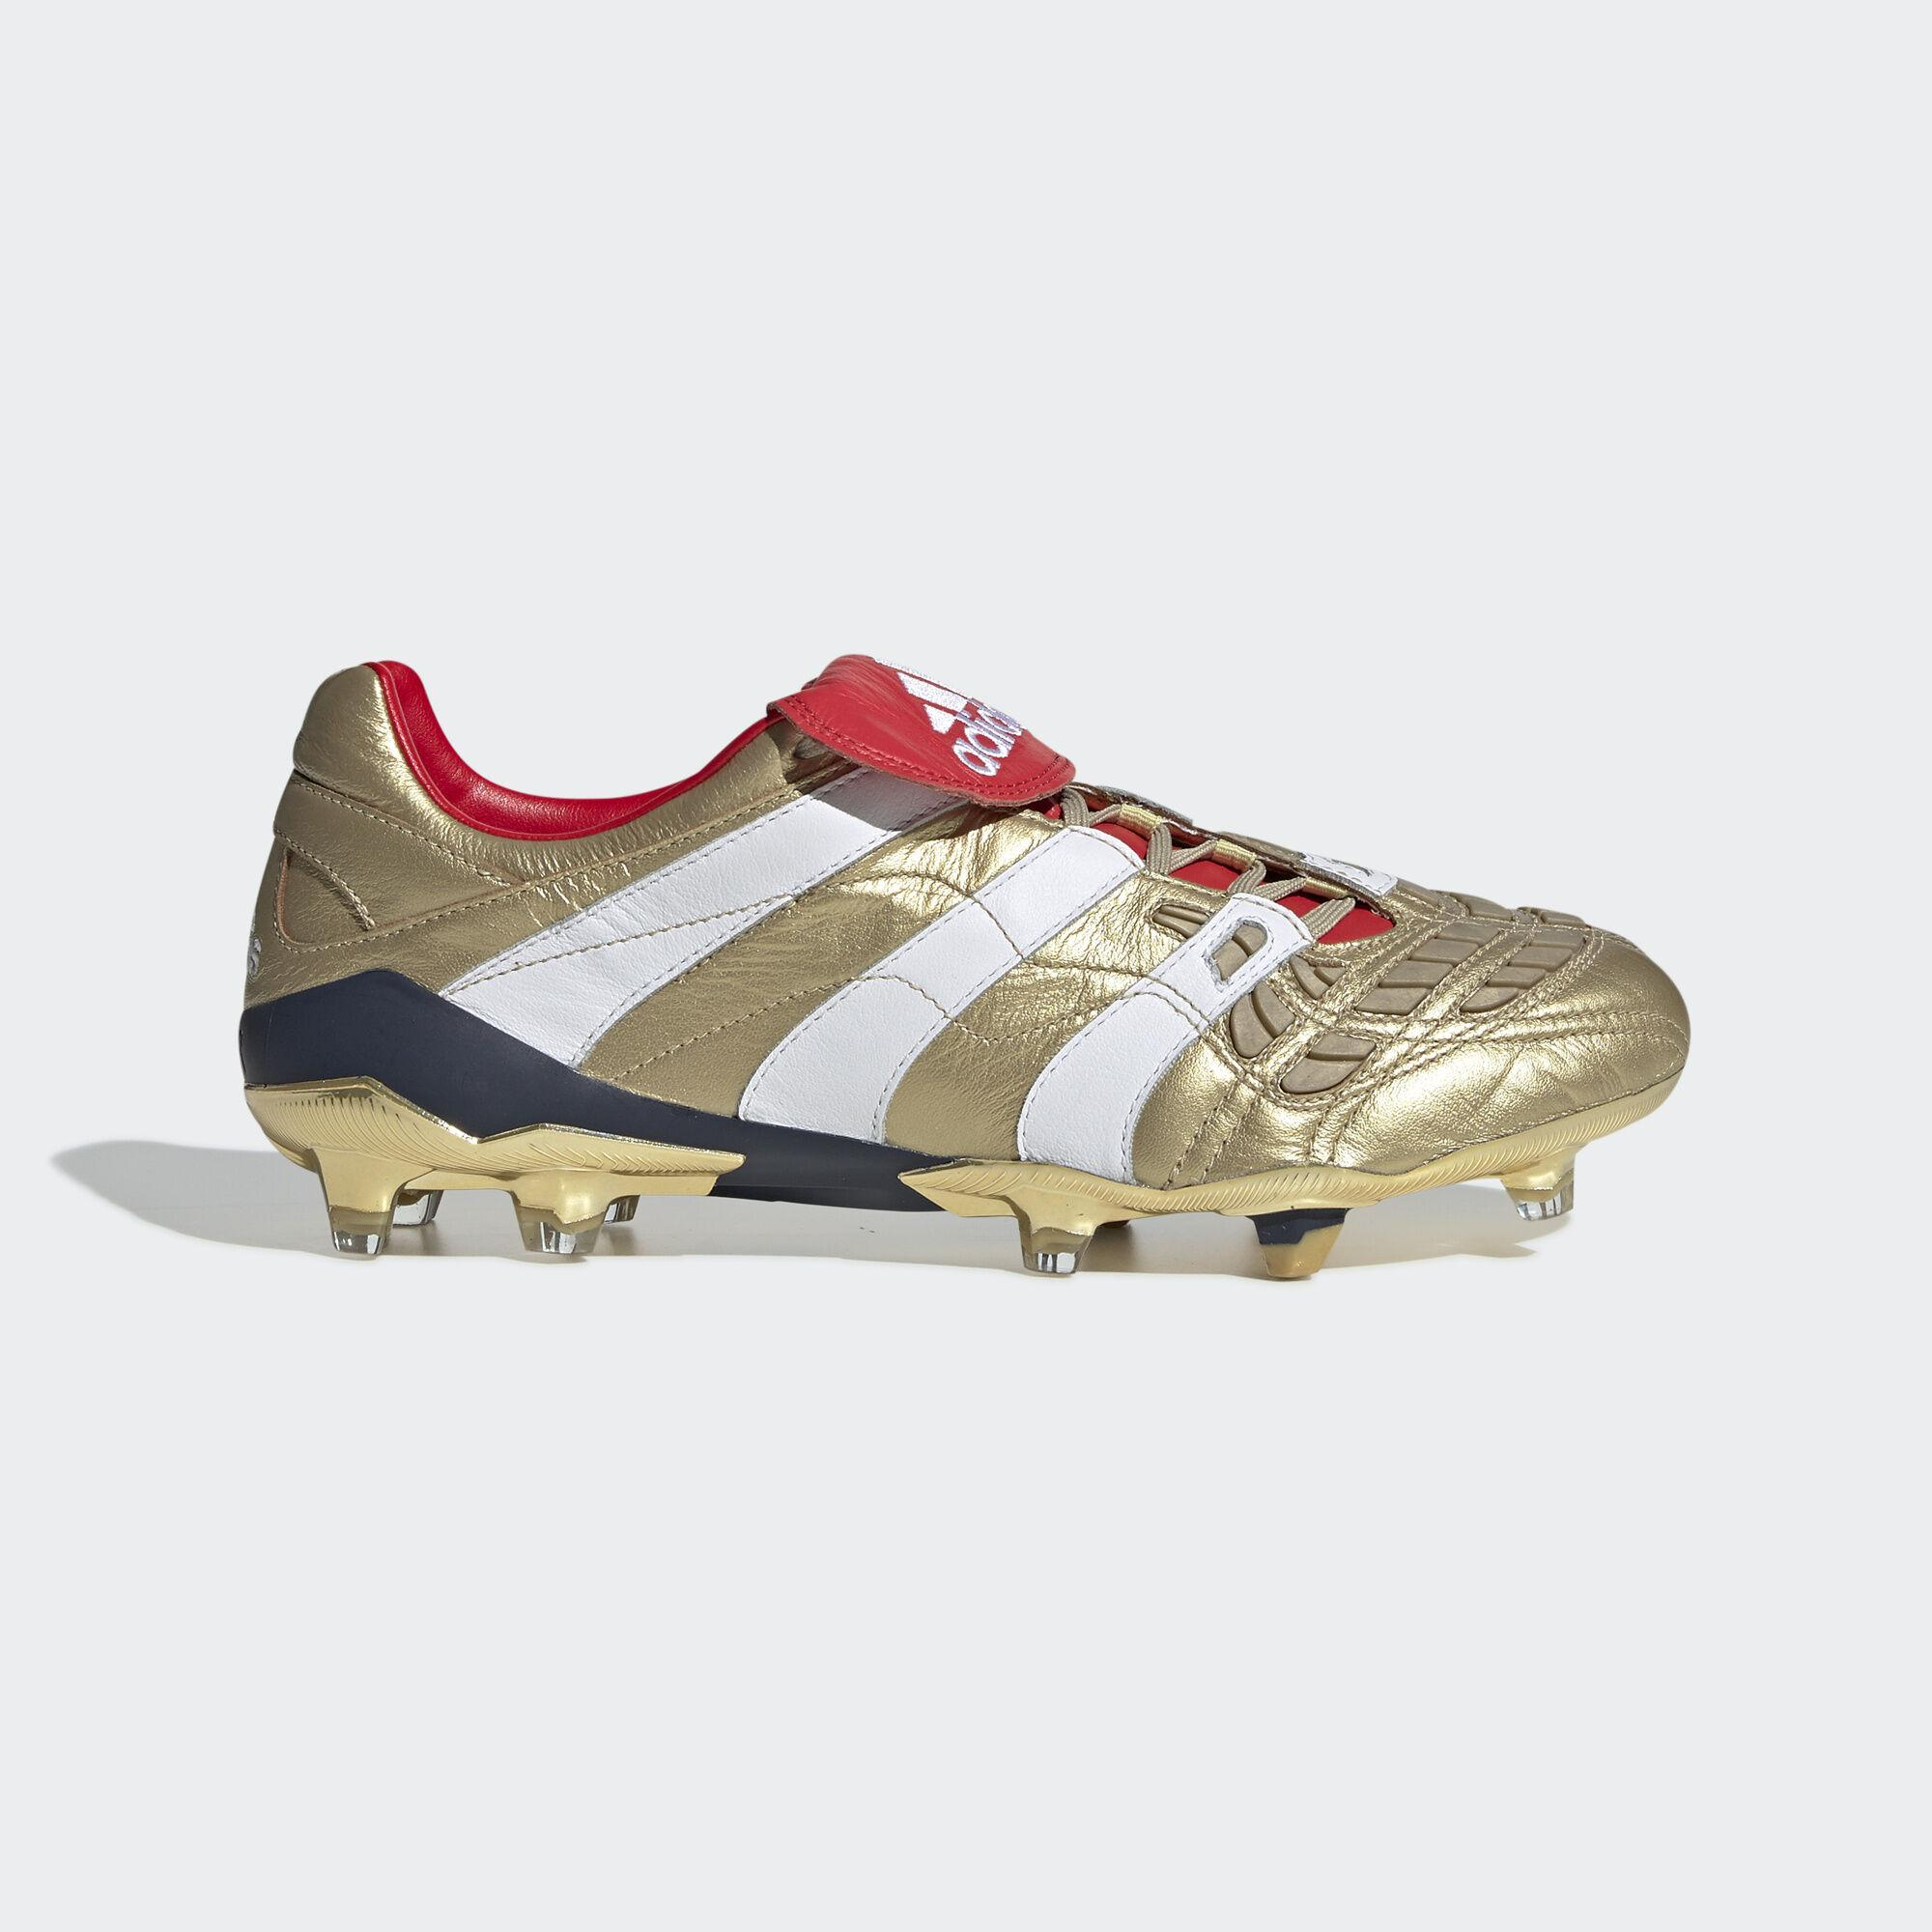 adidas Predator Accelerator Firm Ground Zinédine Zidane